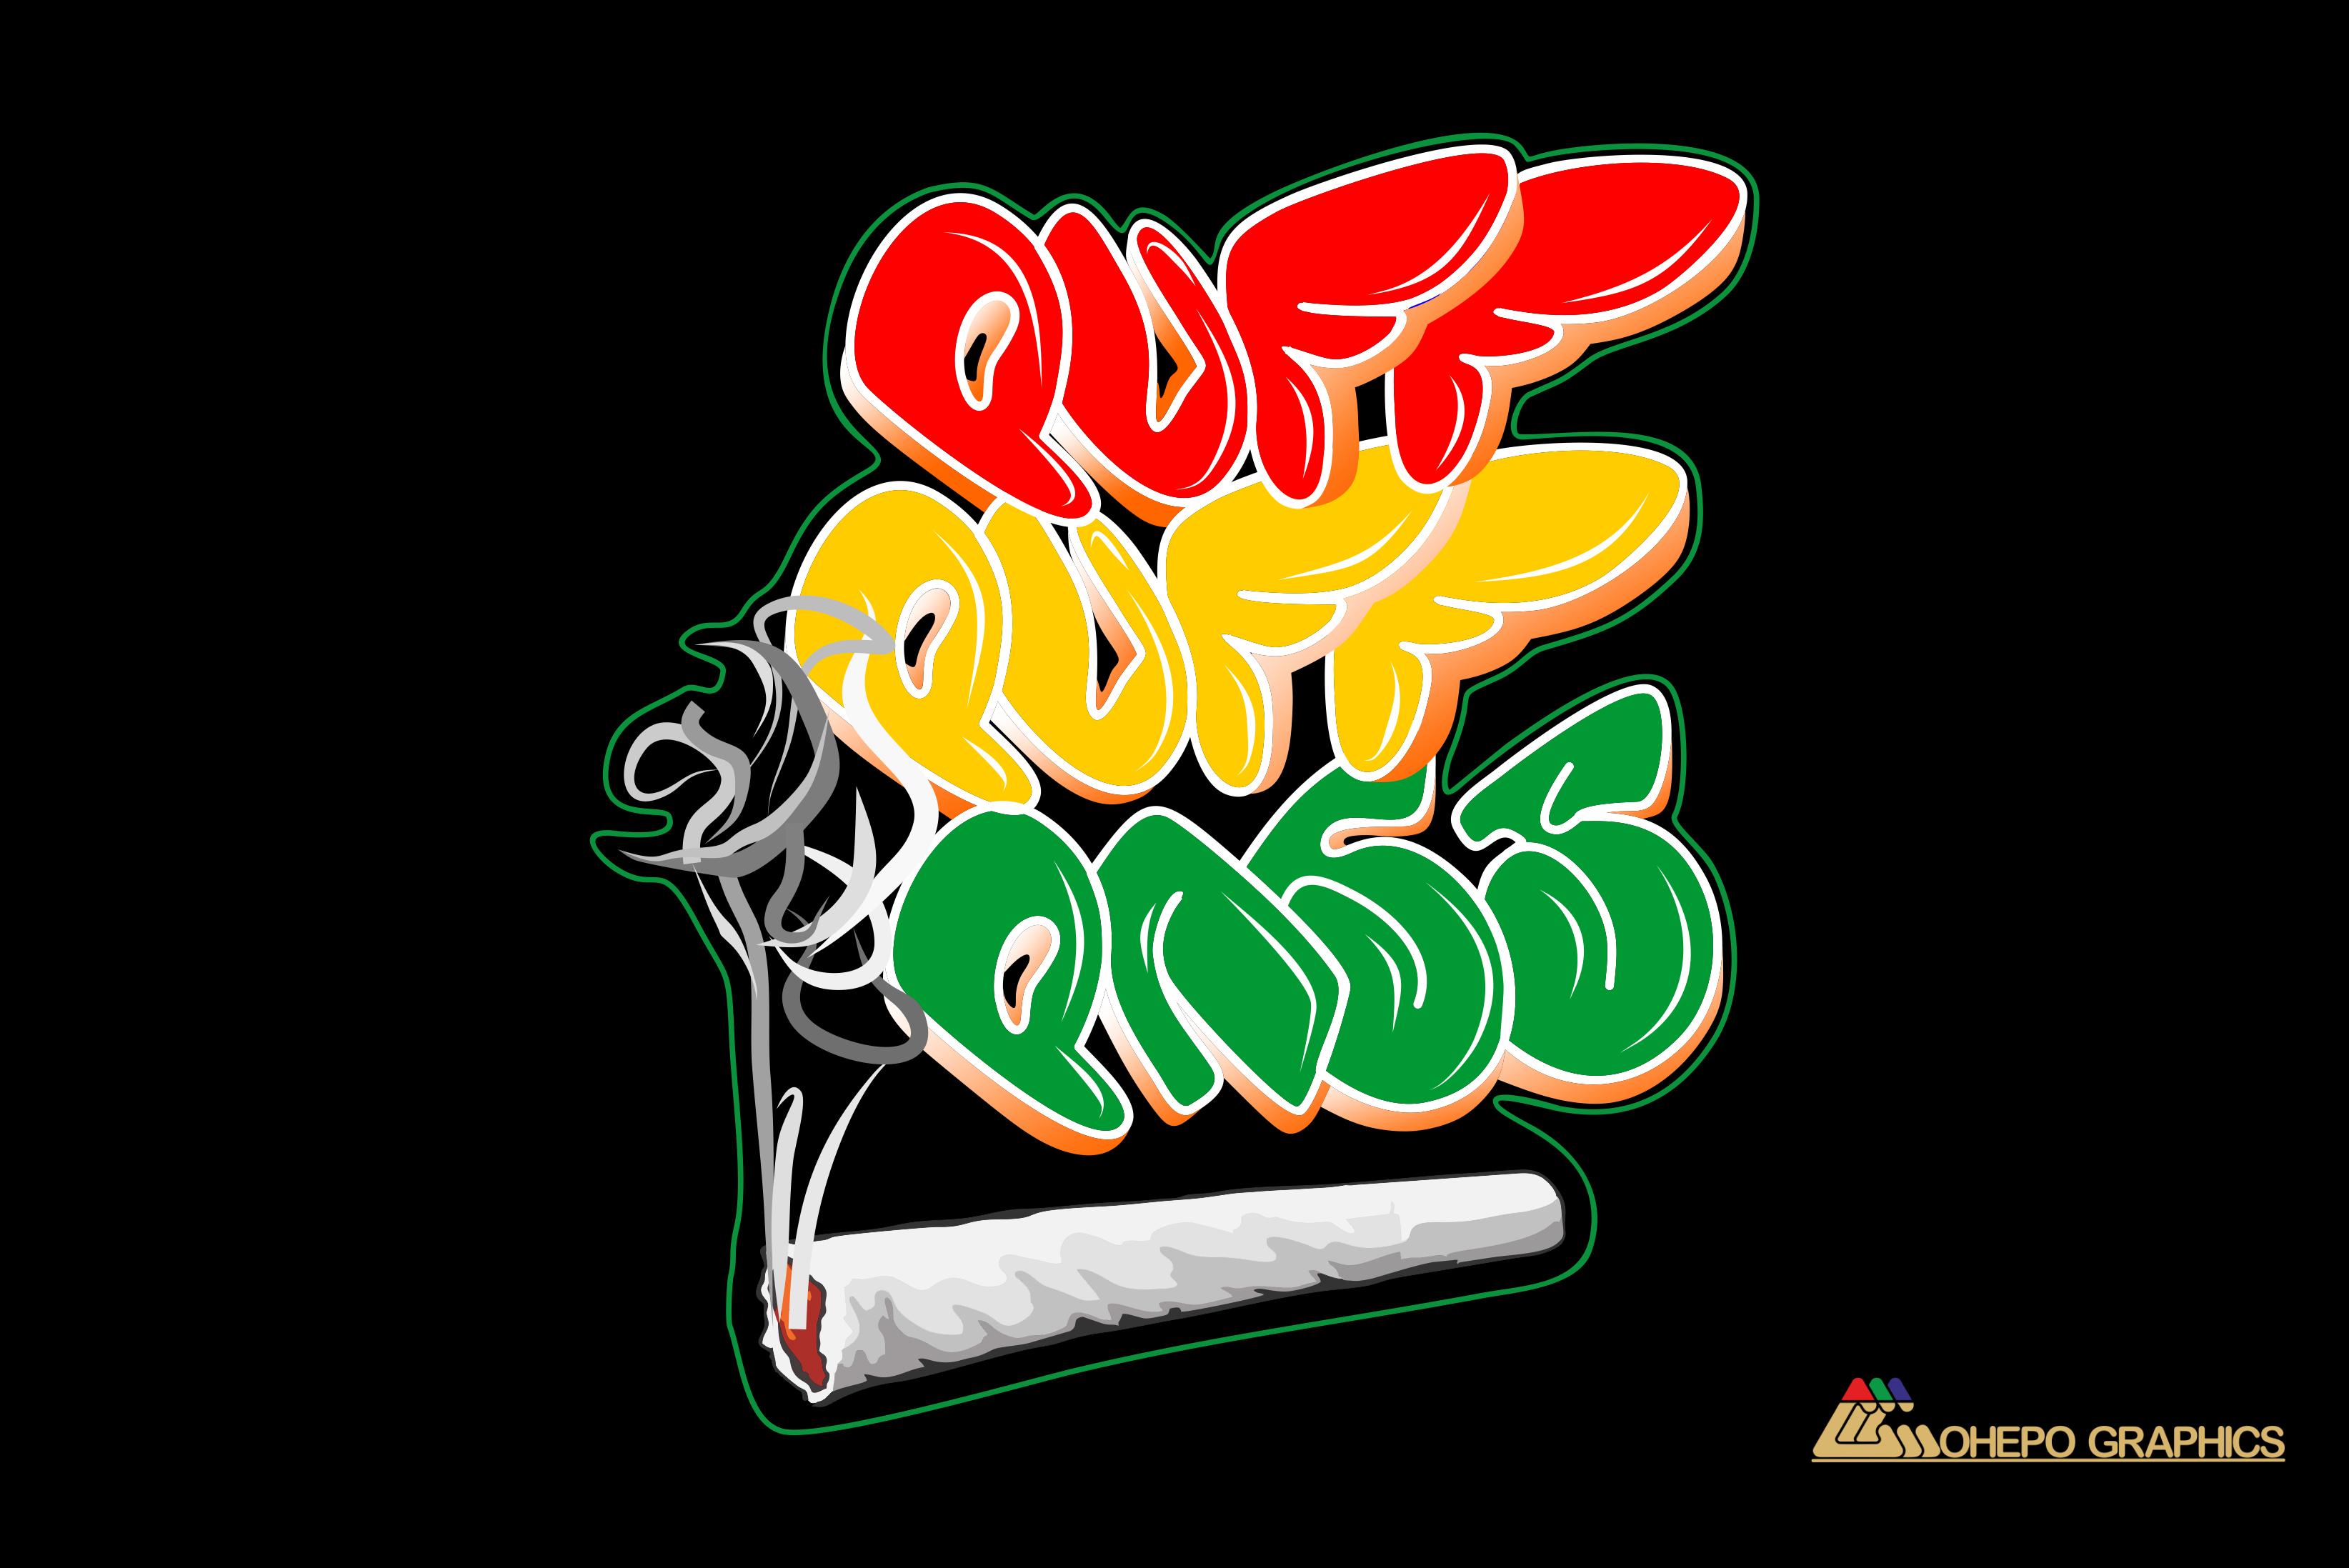 Puff Puff Pass Graffiti Digital Art Design Warm Greetings To You All